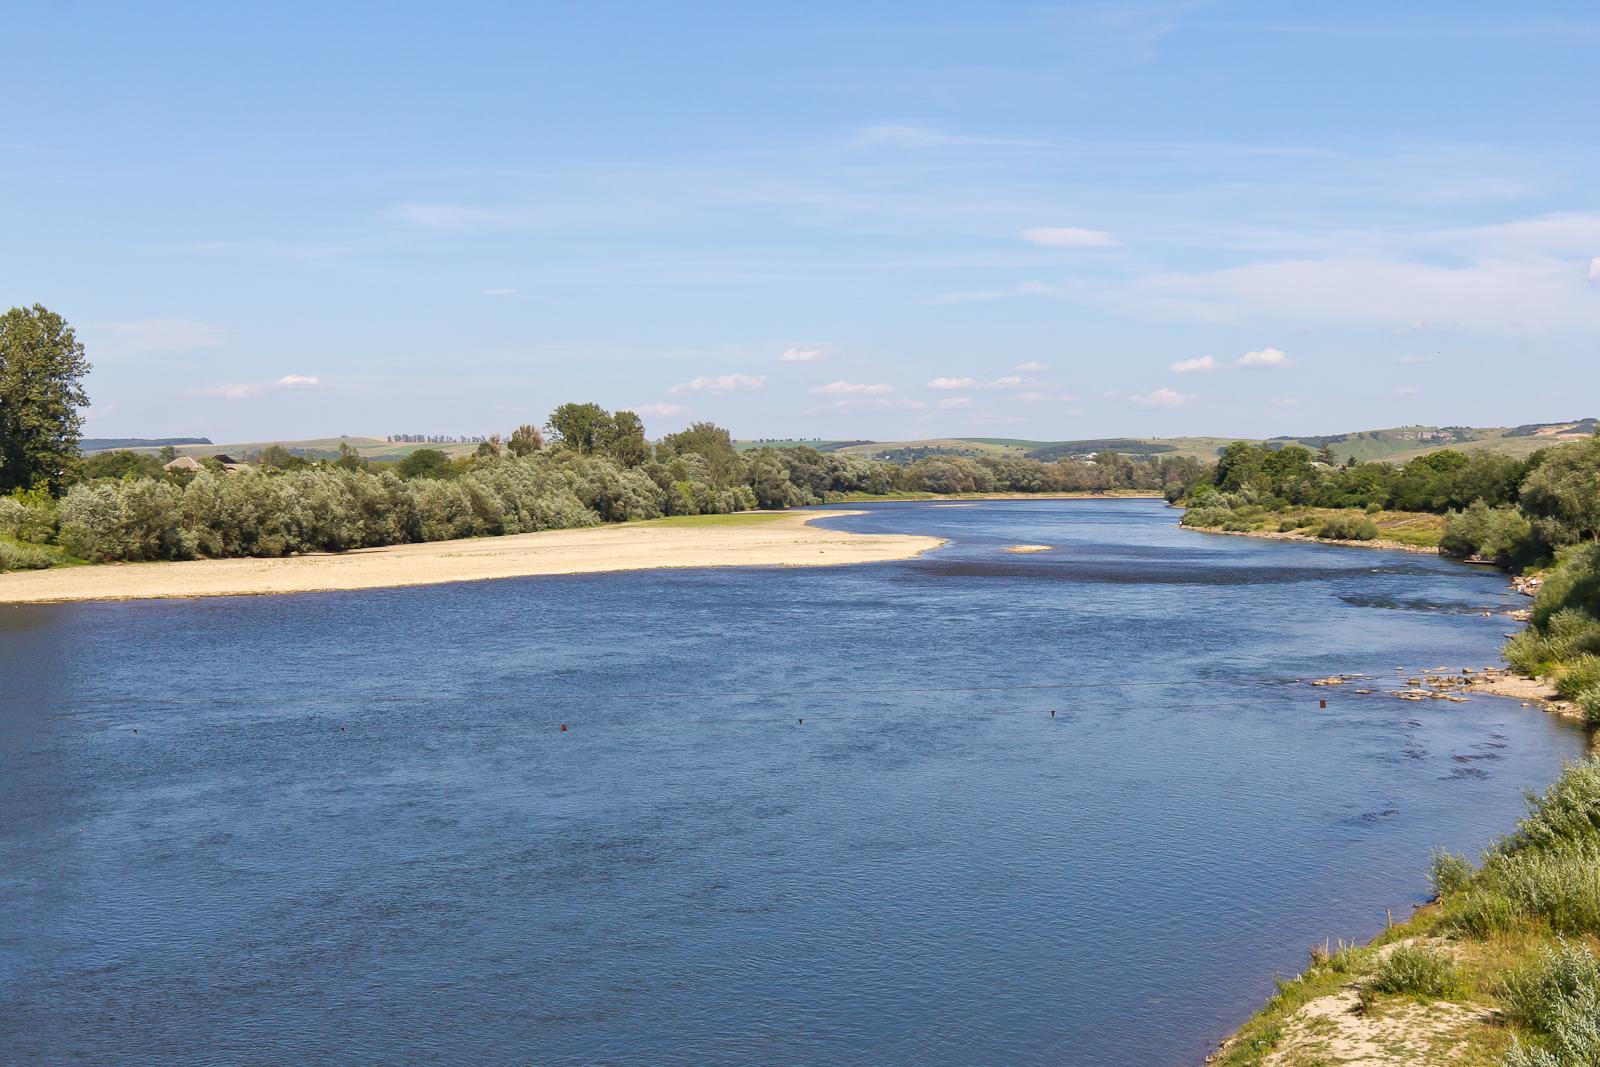 File:Dniester River in Halych, Ukraine-6104.jpg ...